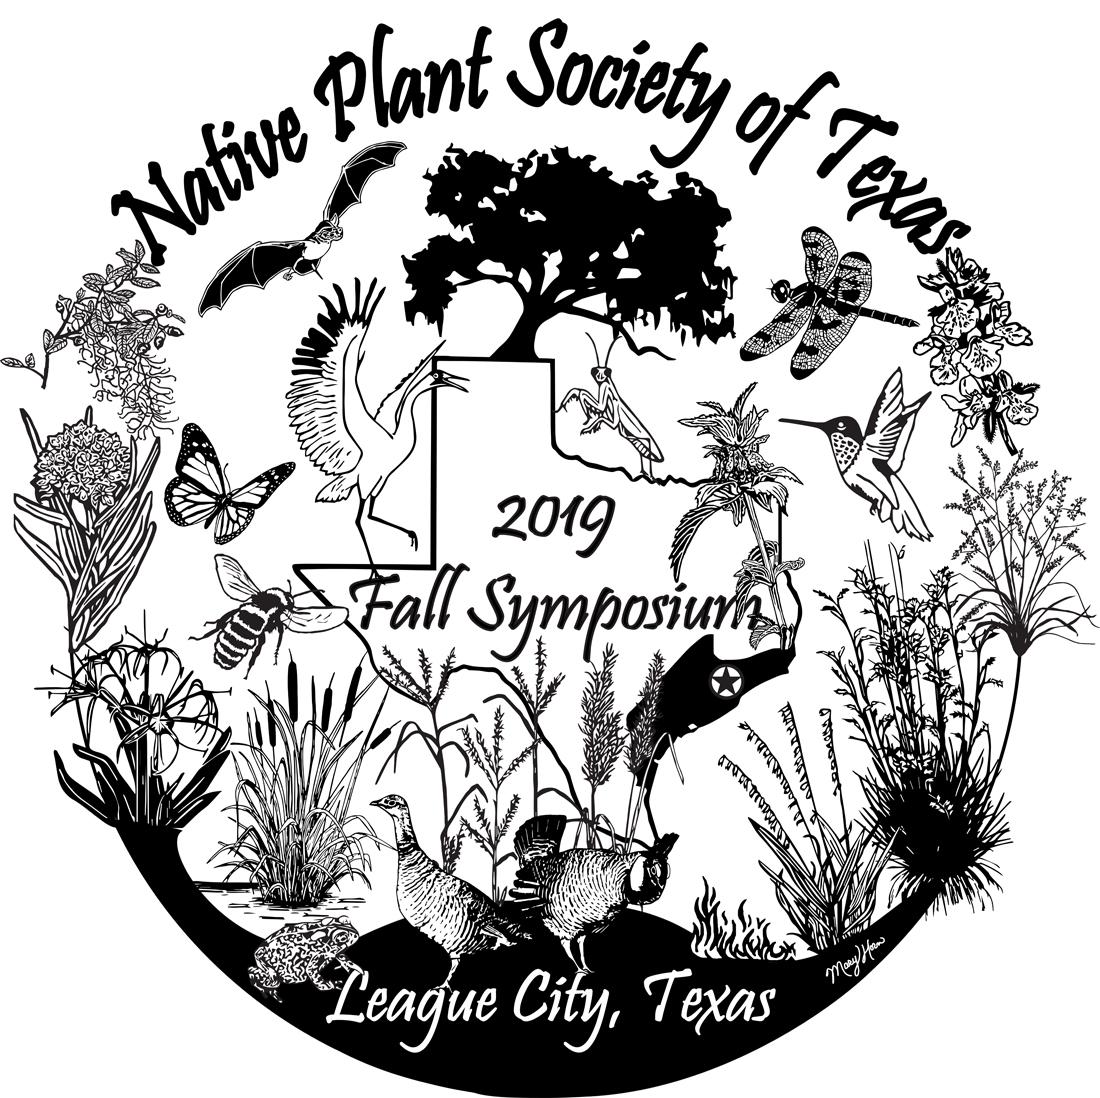 Conserving Native Plants of the Texas Coastal Prairies